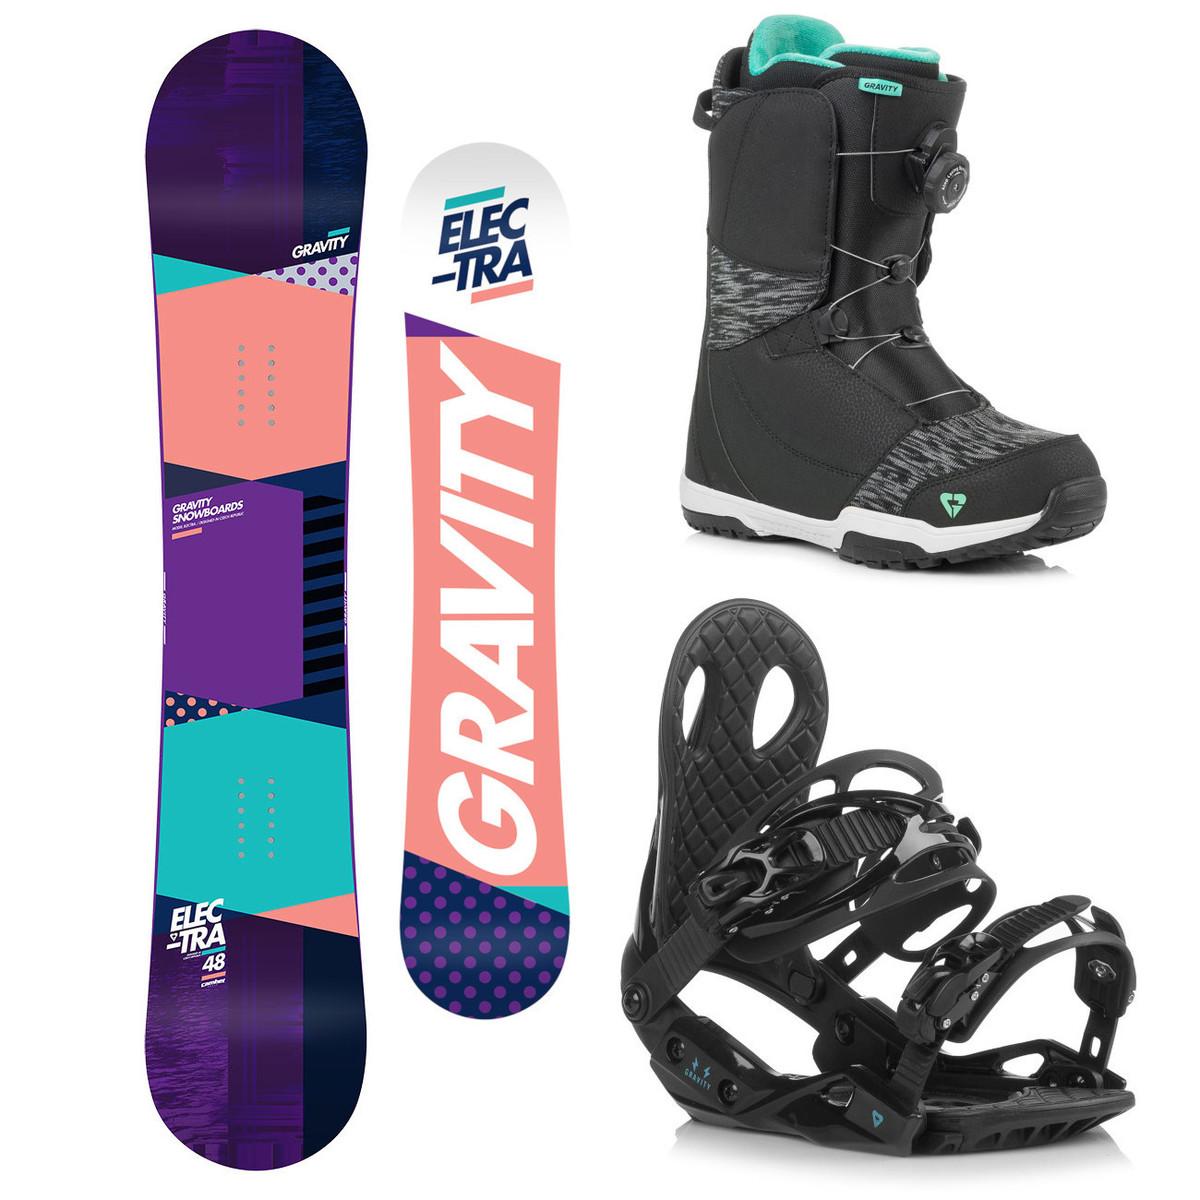 Snowboardový komplet Gravity Electra 18/19 M (EU 37-42) 144 Černá